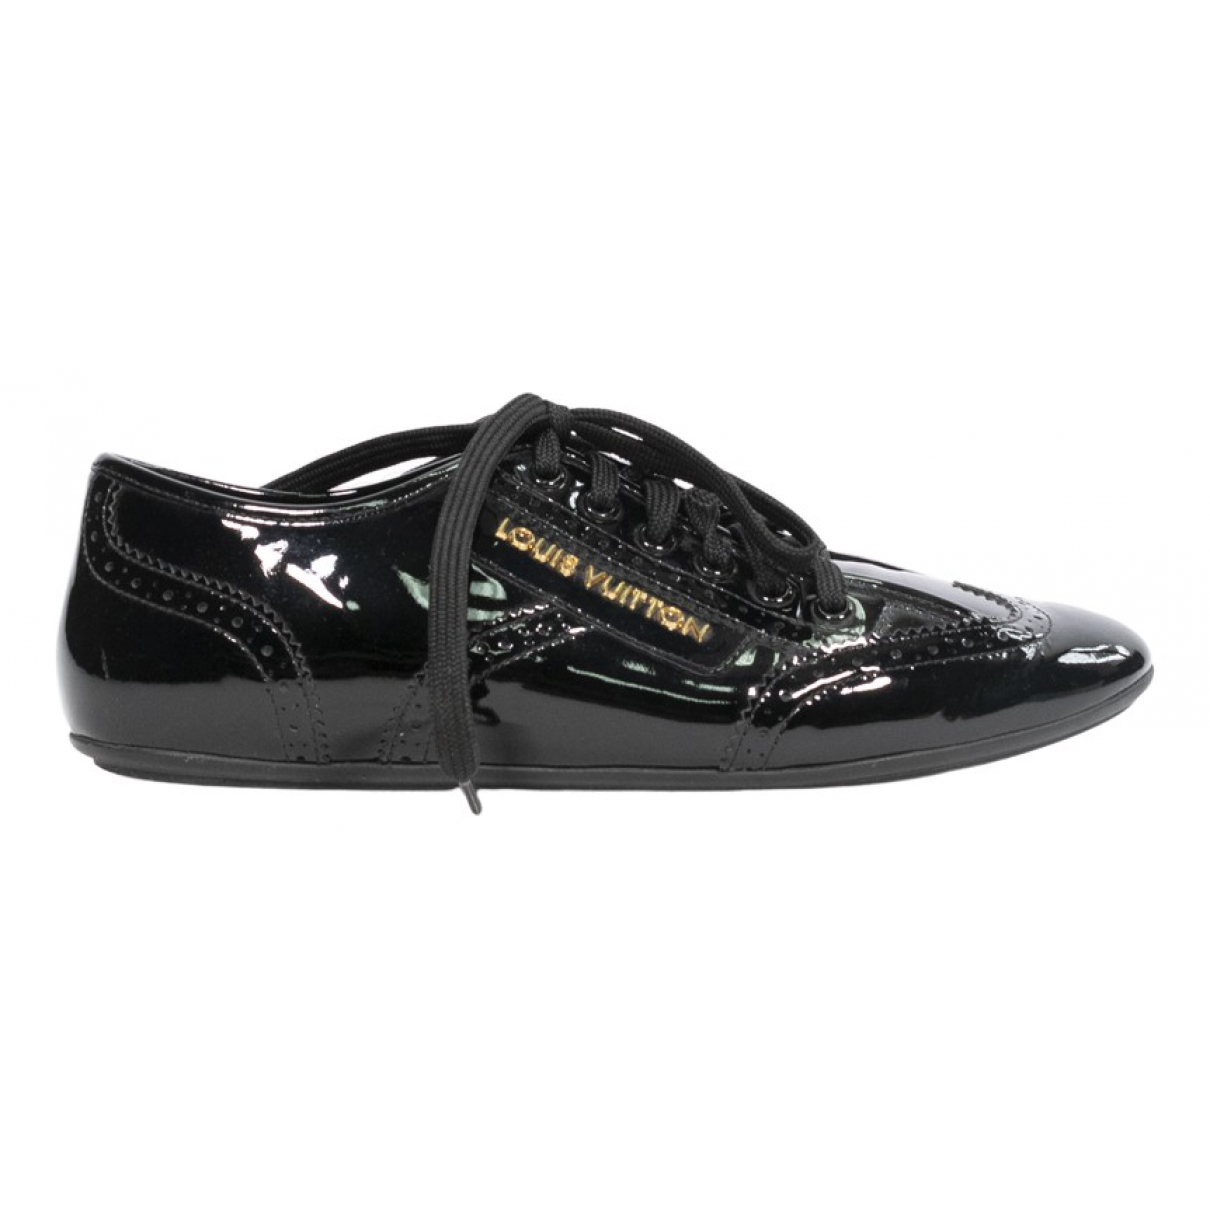 Louis Vuitton FrontRow Sneakers in  Schwarz Lackleder